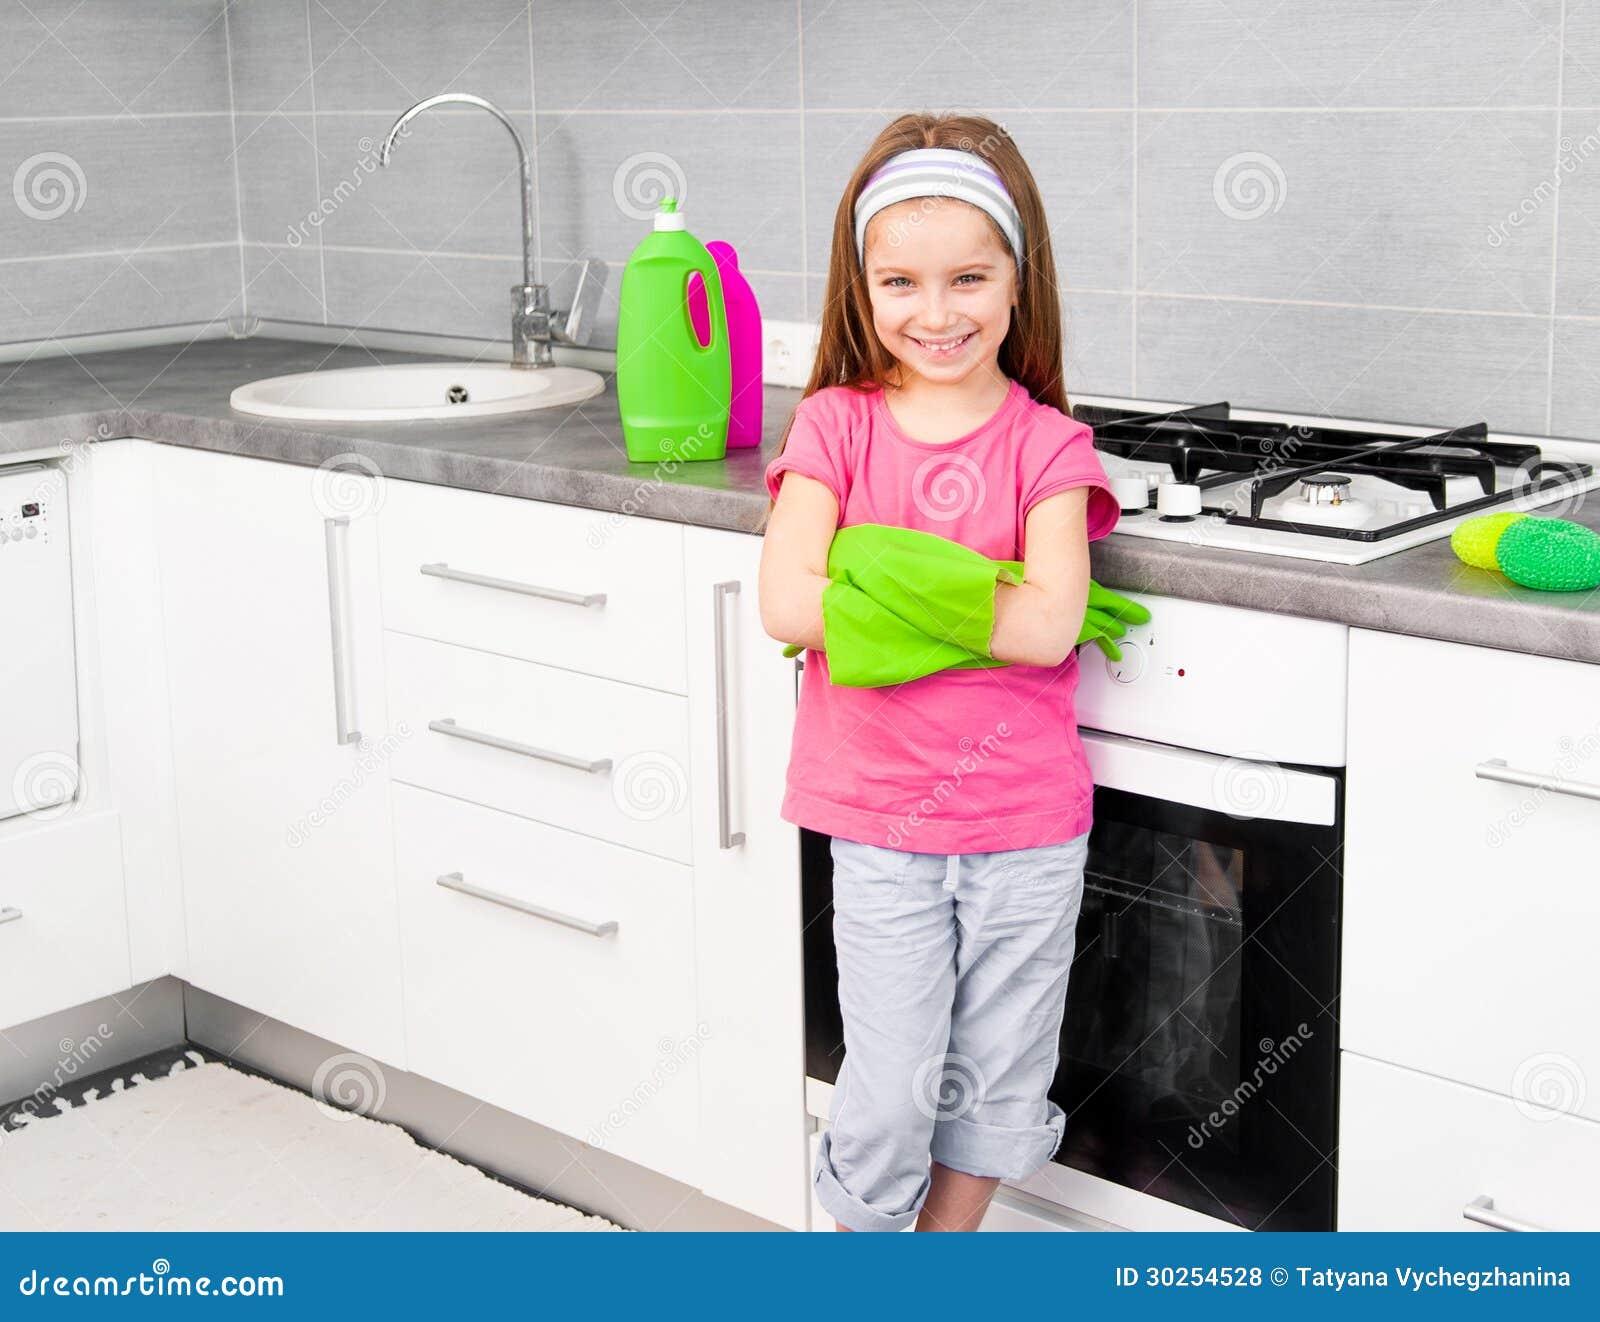 Tatyana S Kitchen